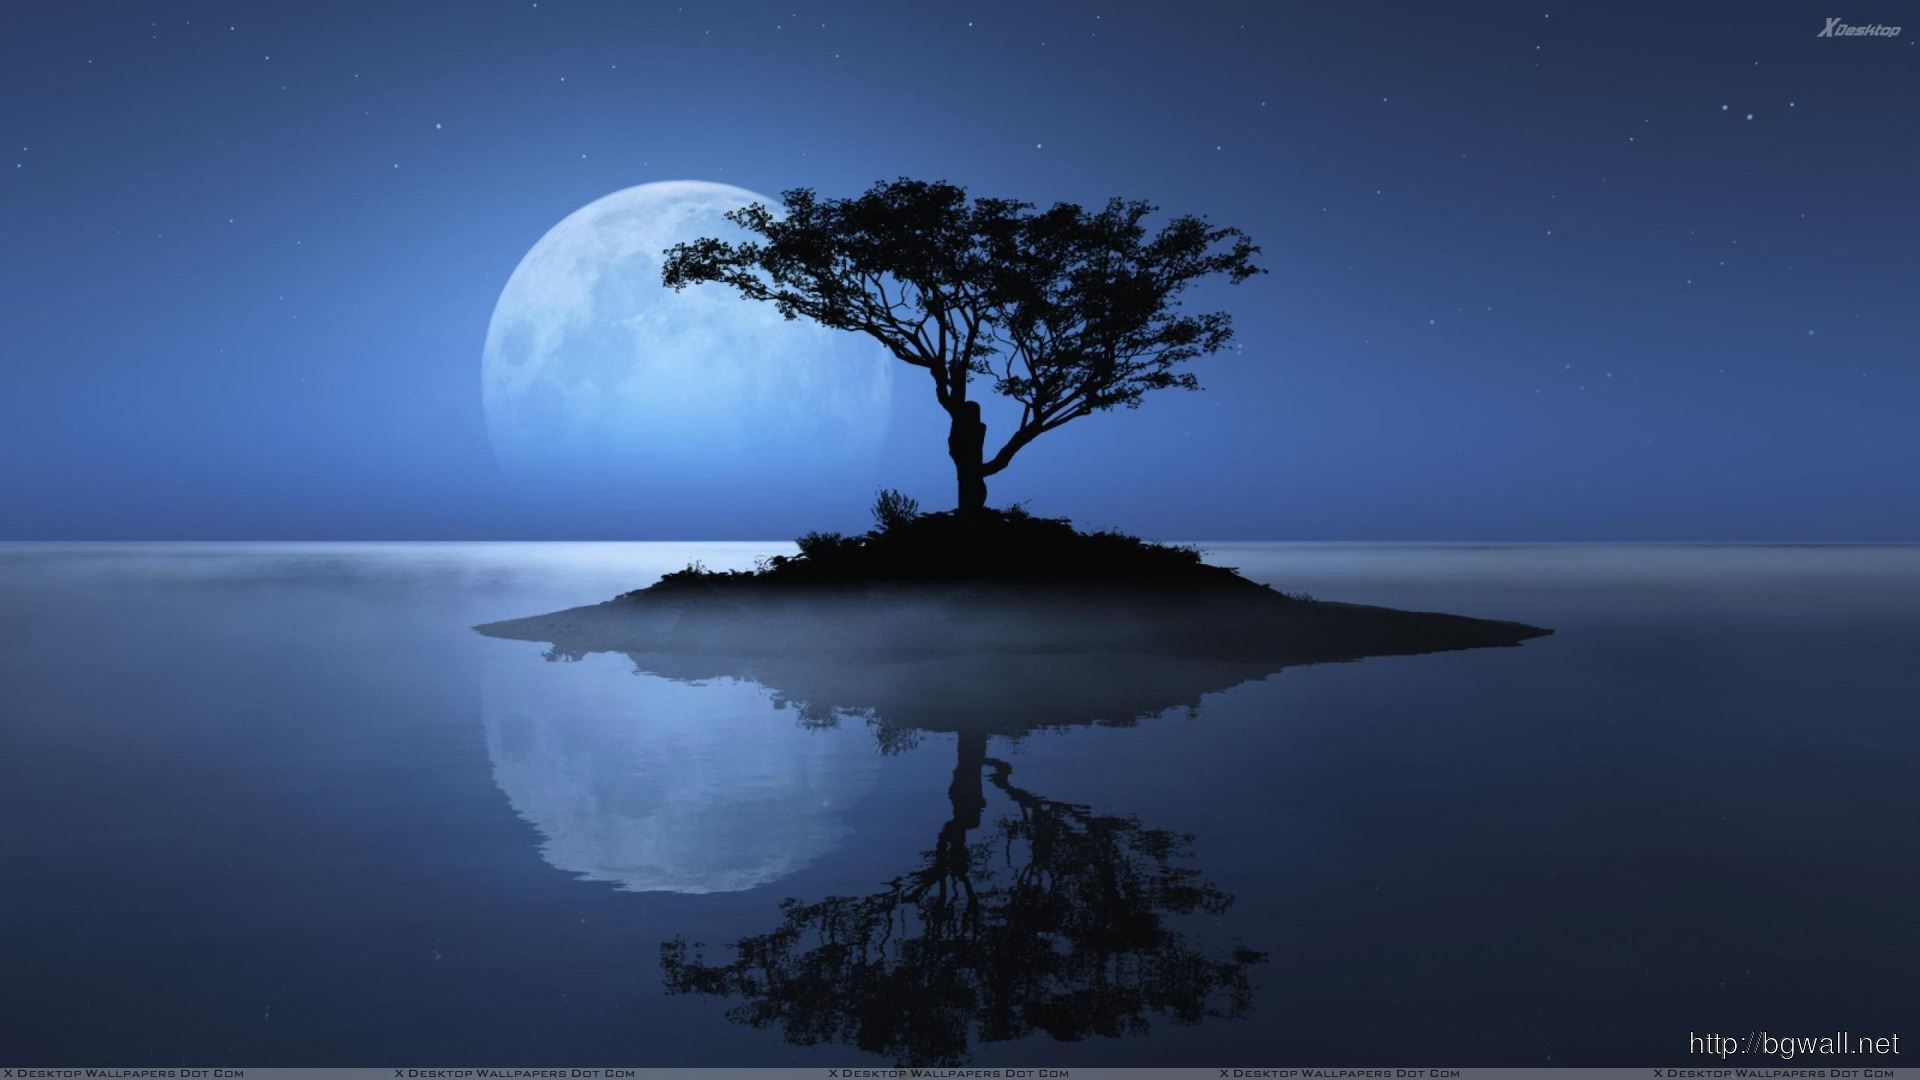 Blue Moon Over The Water Evening Scene Wallpaper